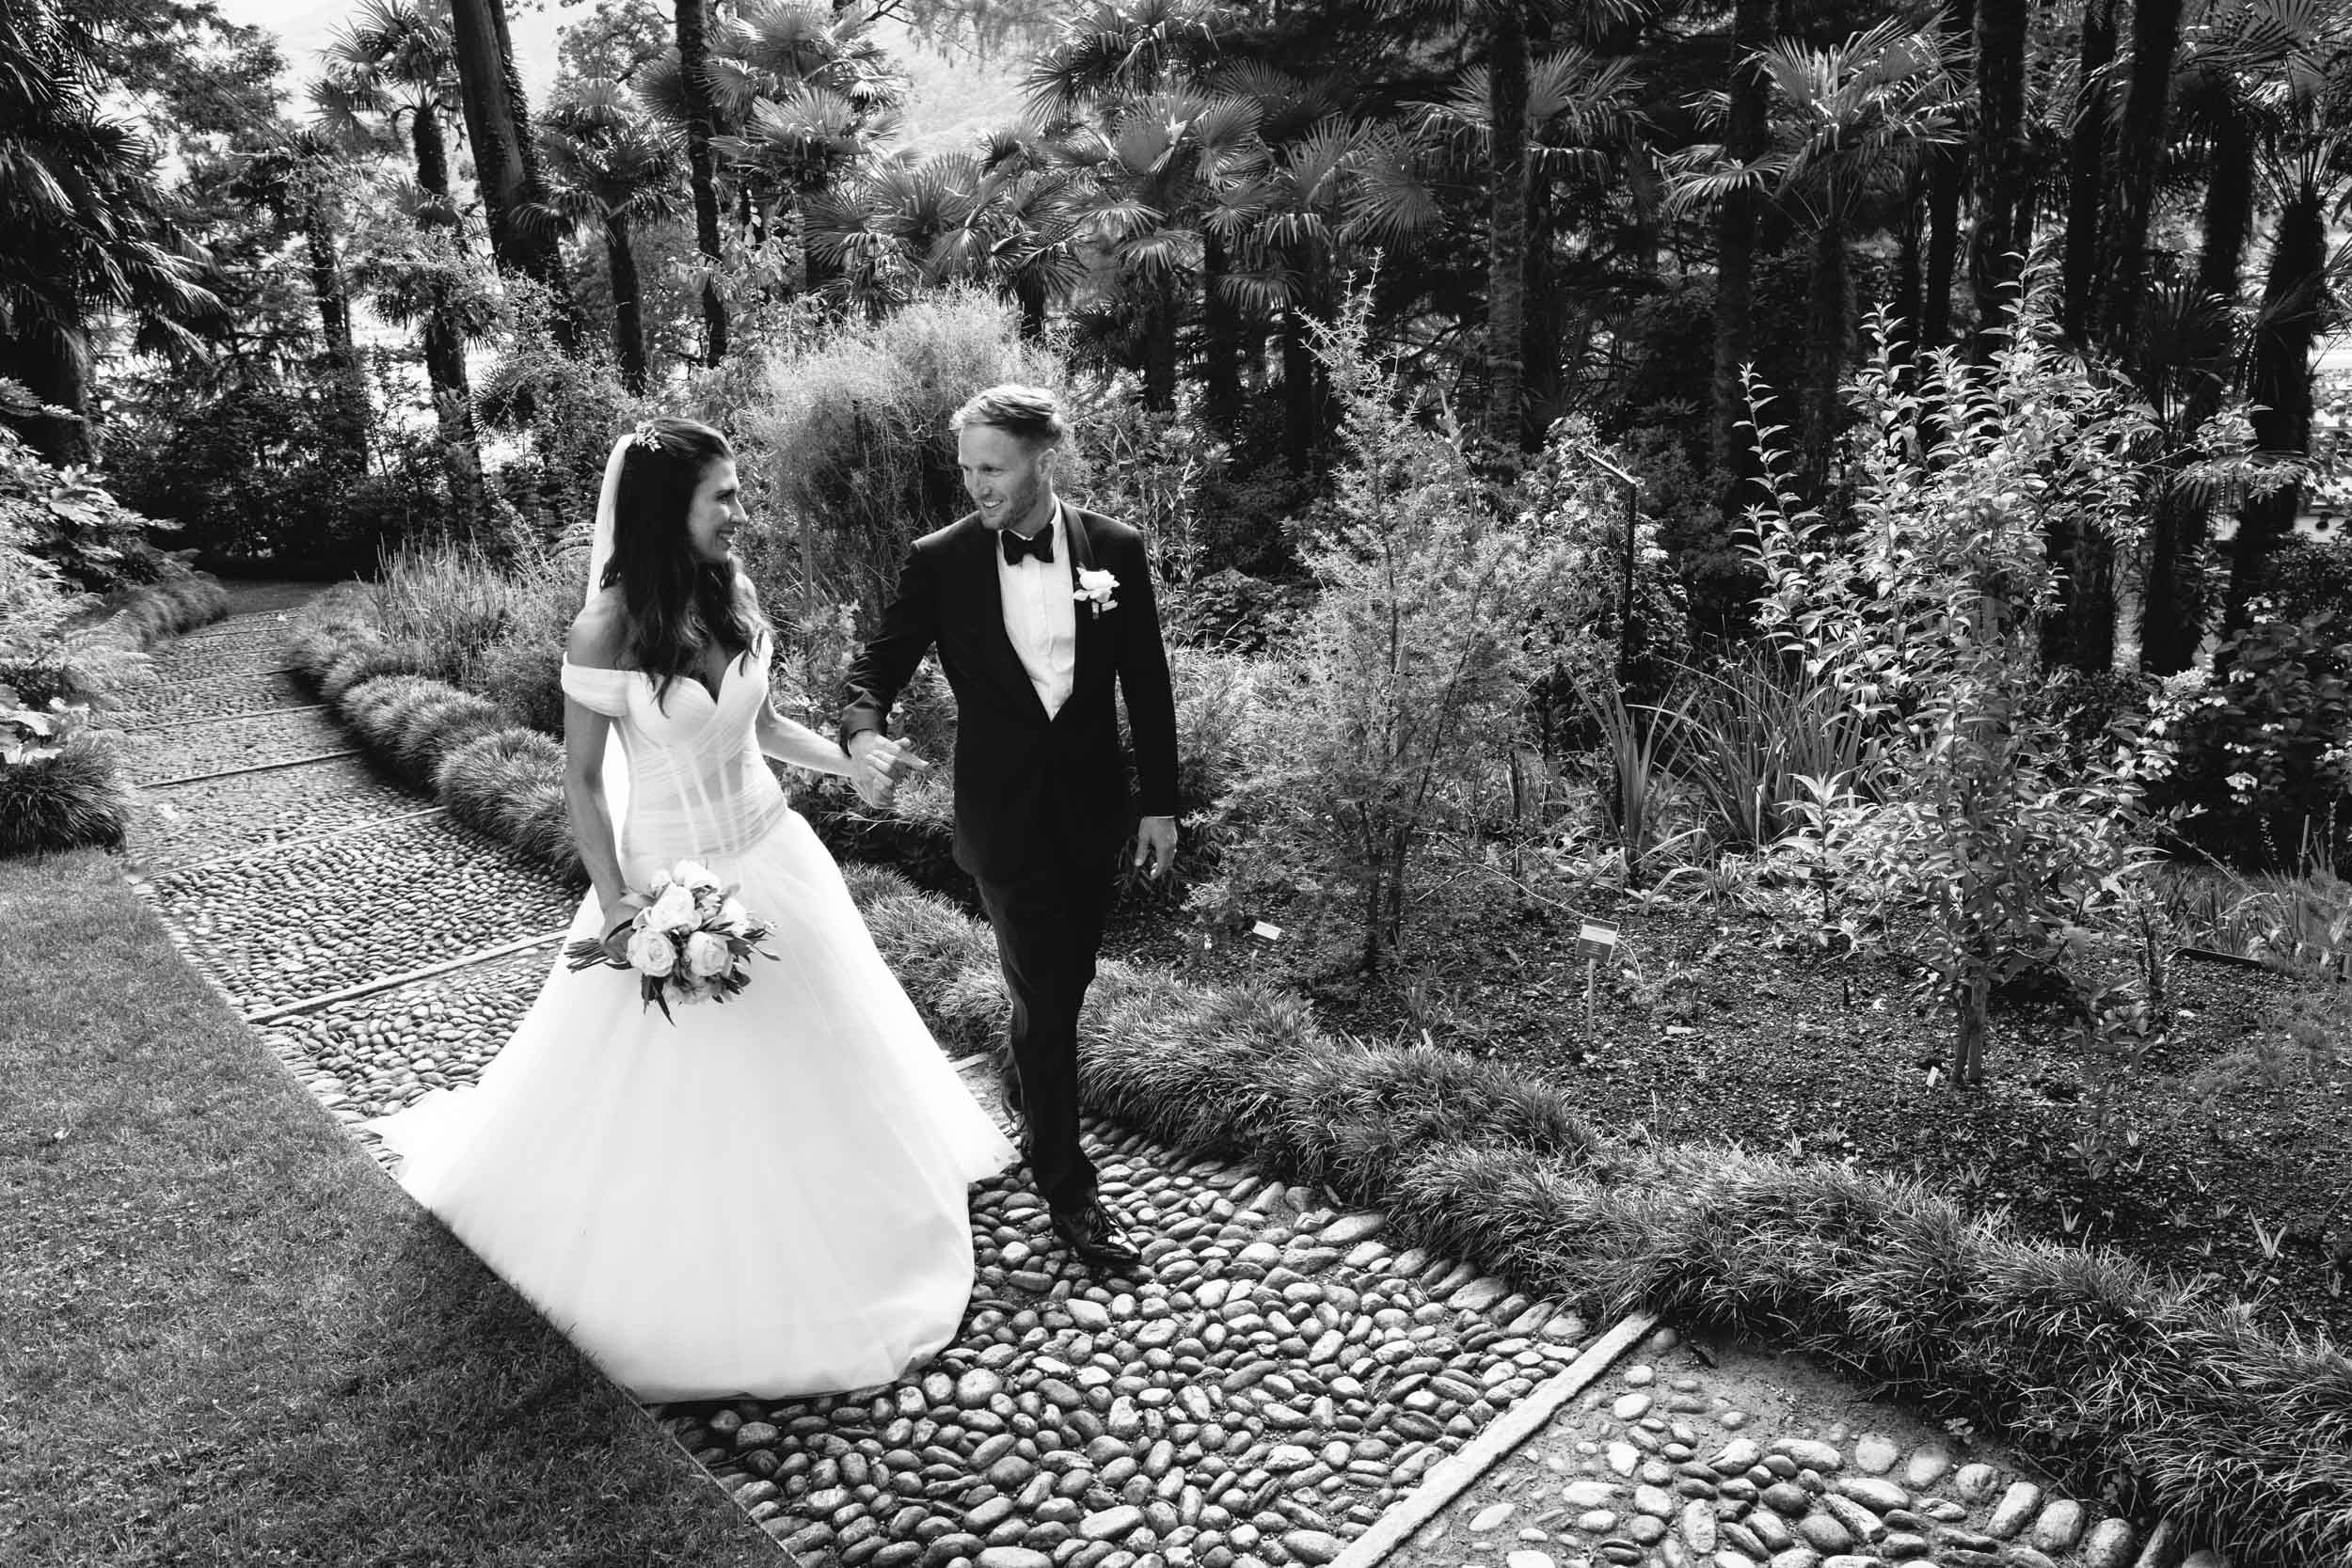 olivia-andreas-wedding-switzerland-411.jpg